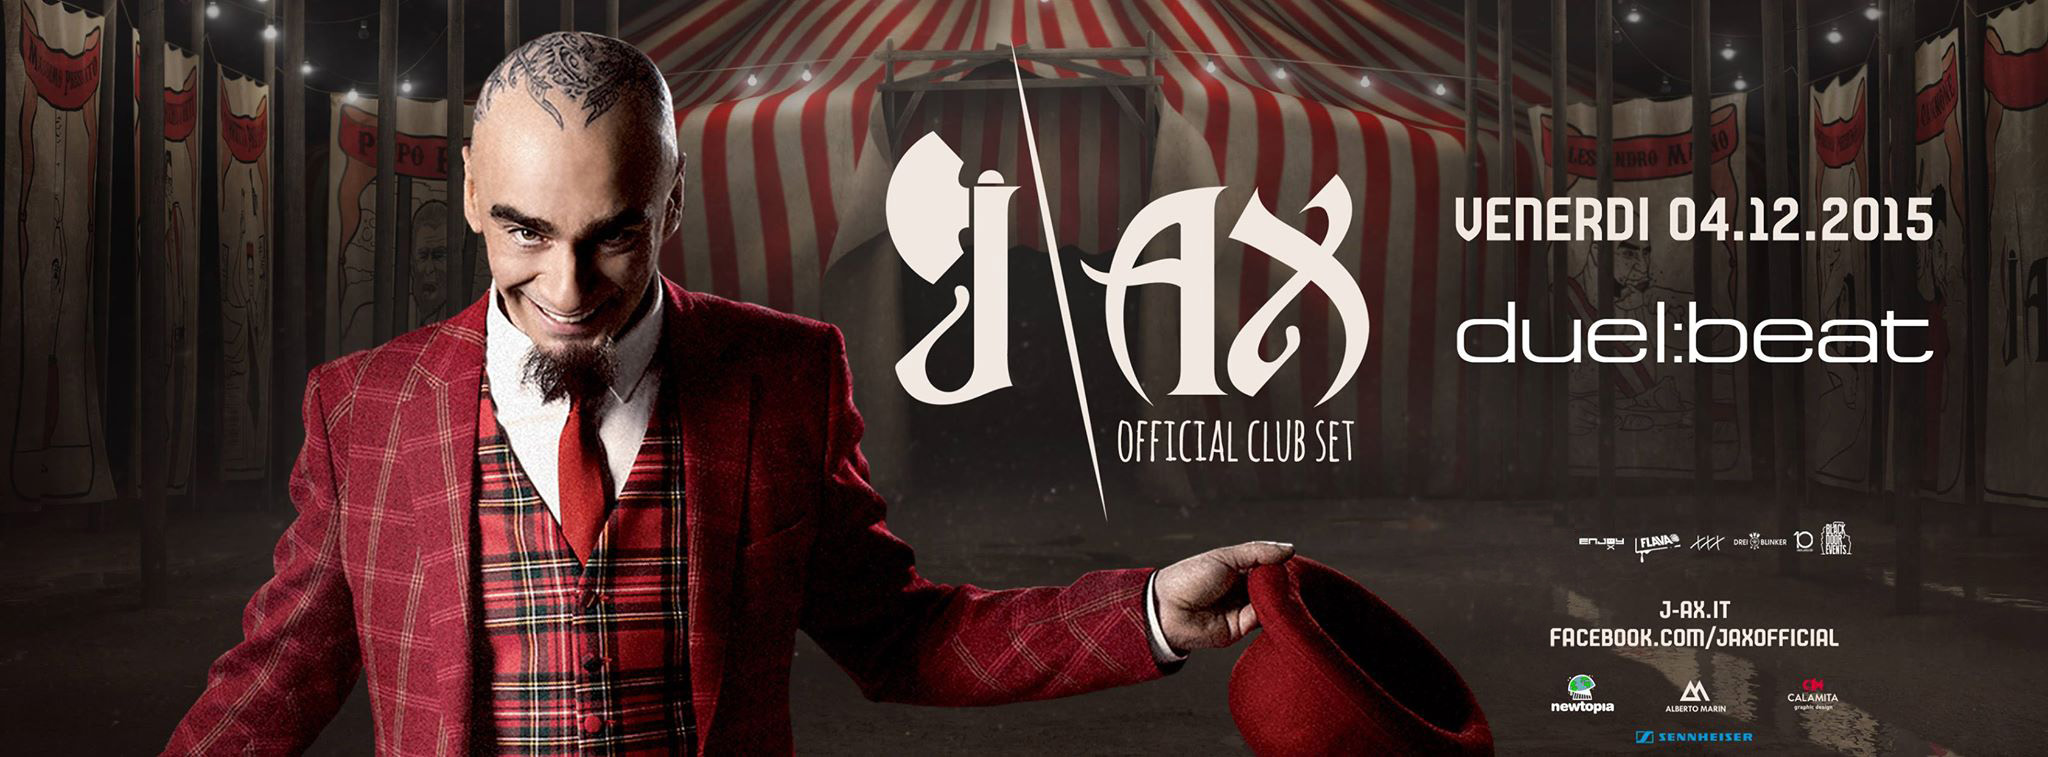 J-Ax al Duel Beat il 4 dicembre